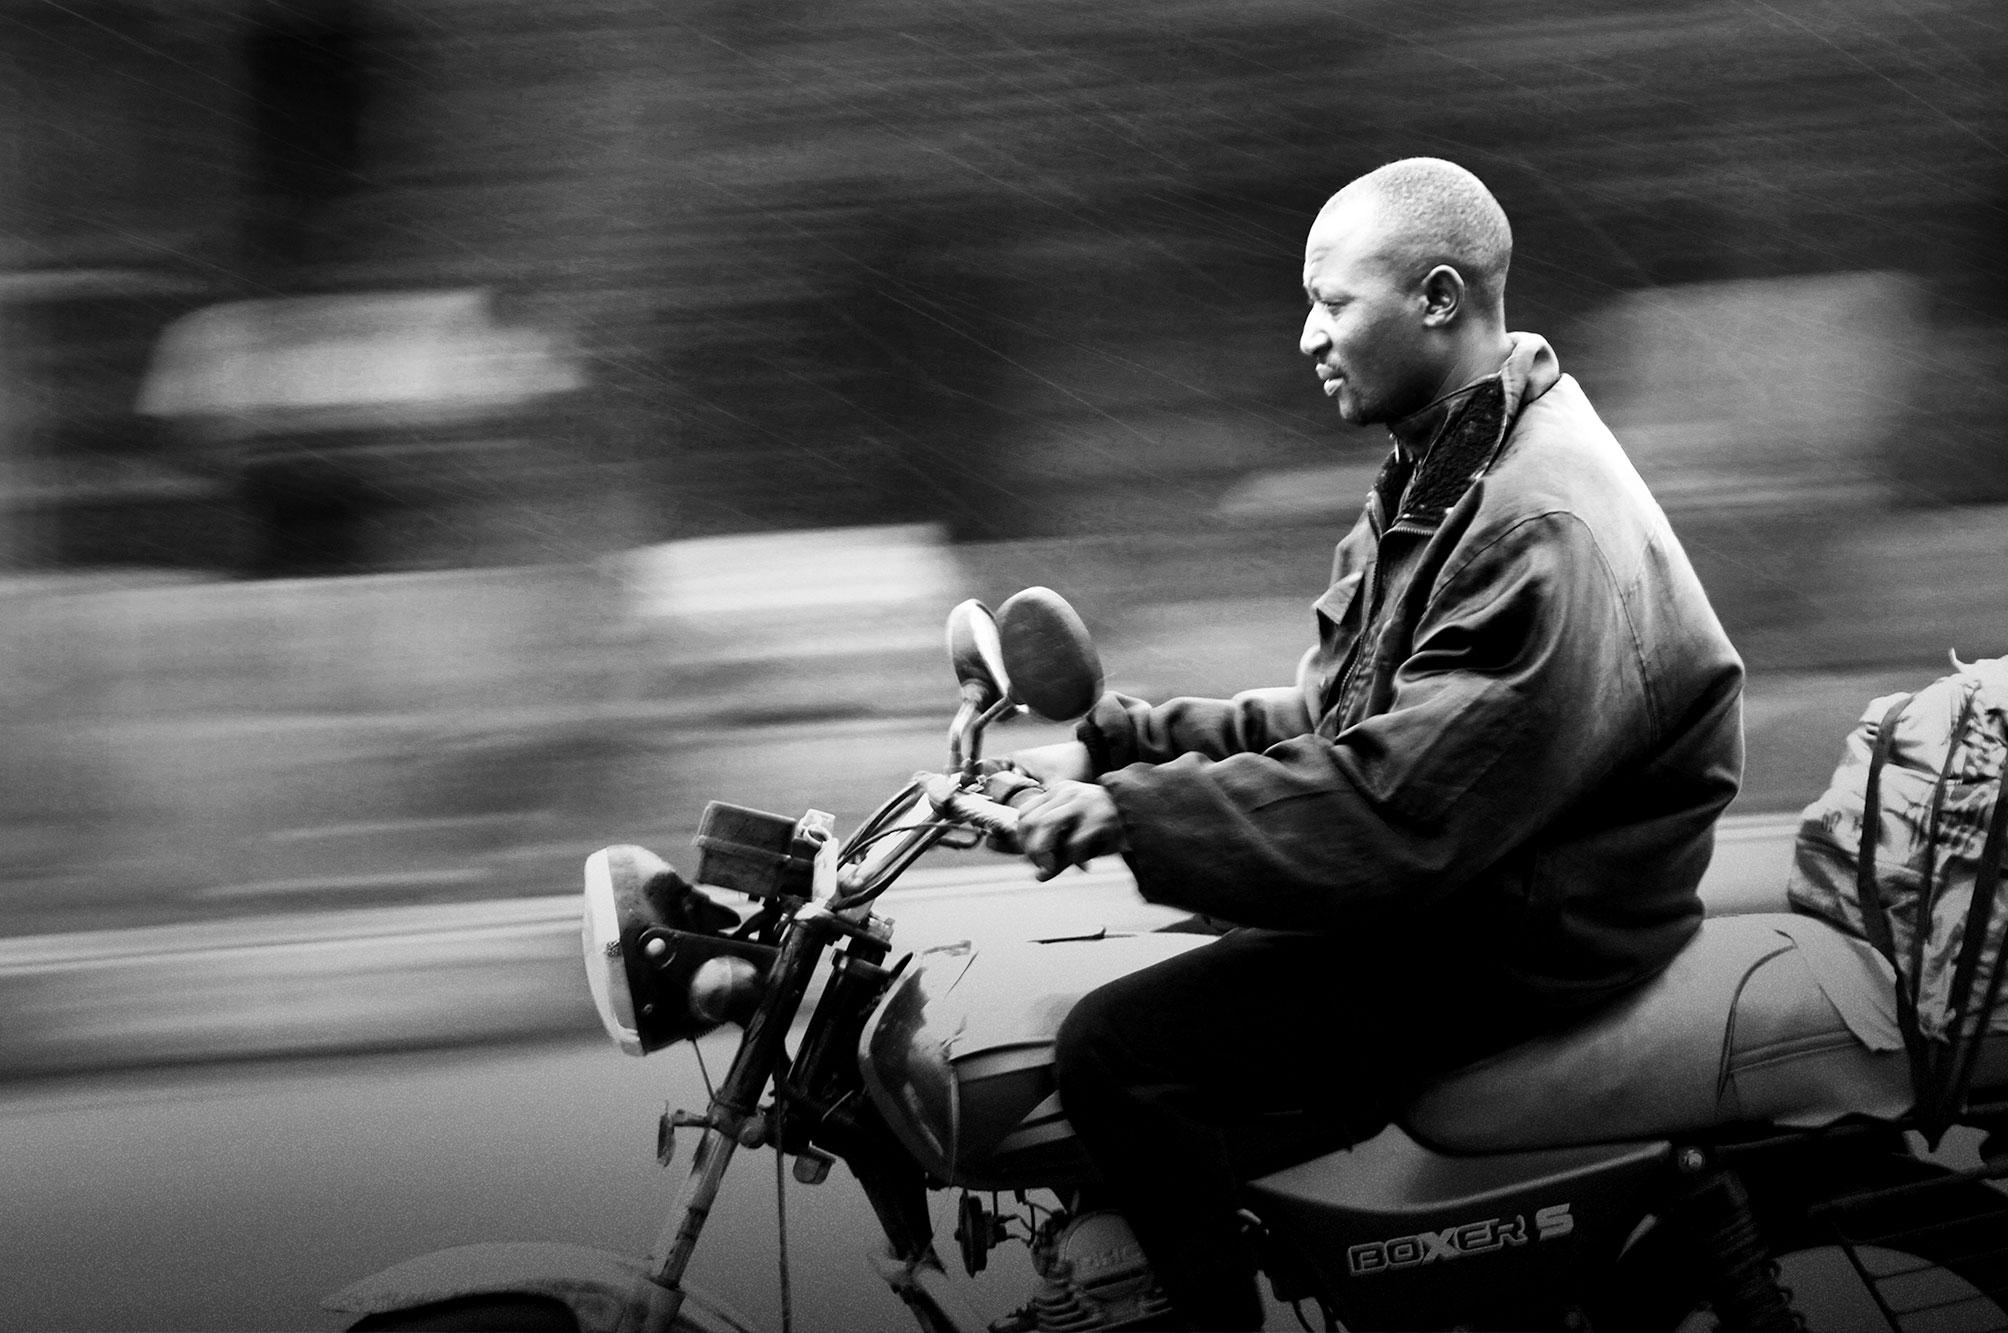 Uganda Man on Motorbike